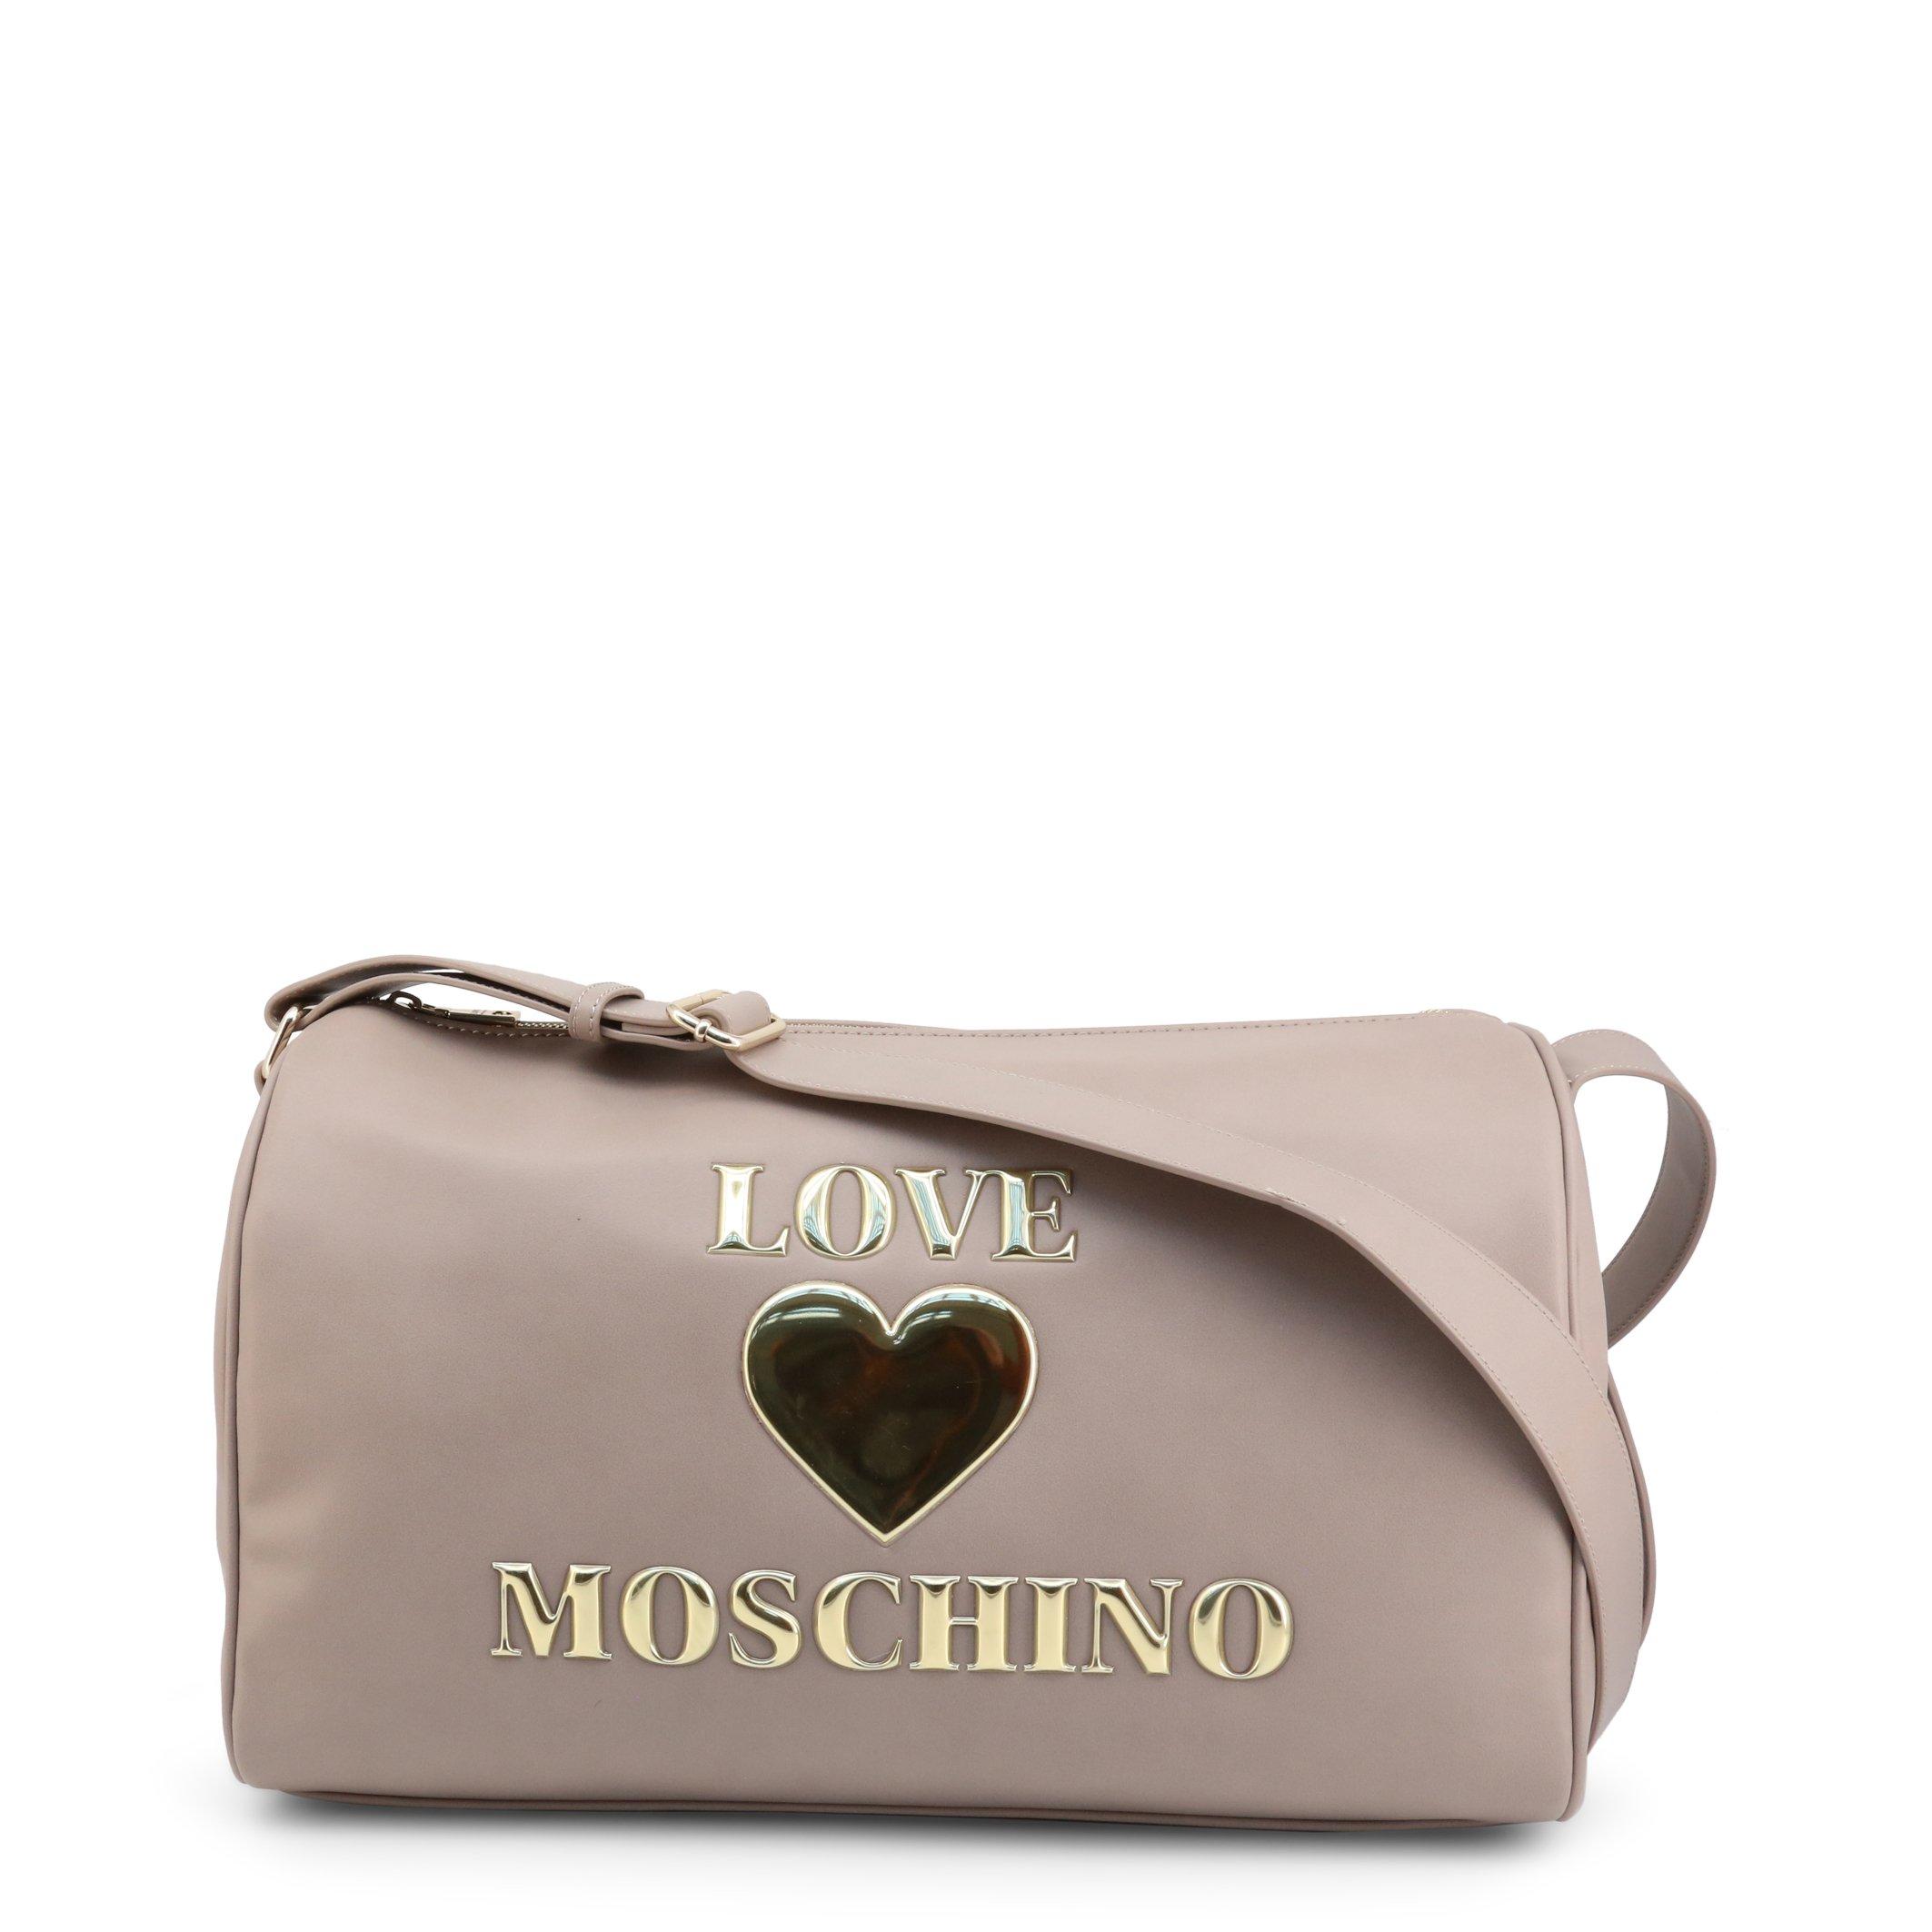 Love Moschino Women's Crossbody Bag Various Colours JC4039PP1BLE - brown NOSIZE